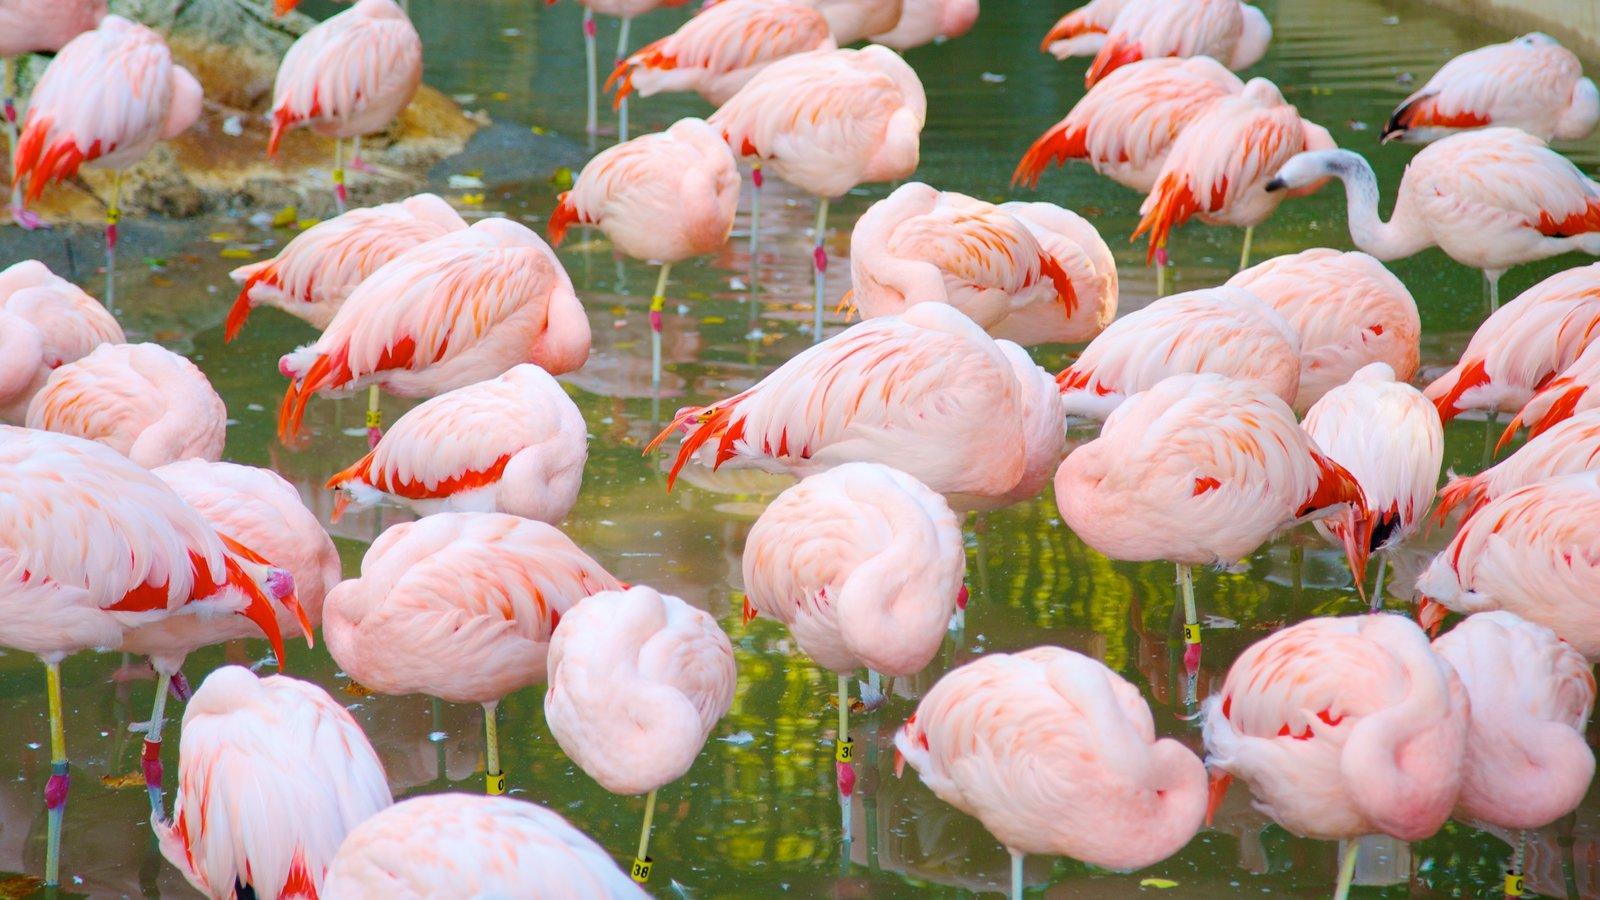 Zoo Atlanta showing zoo animals and bird life